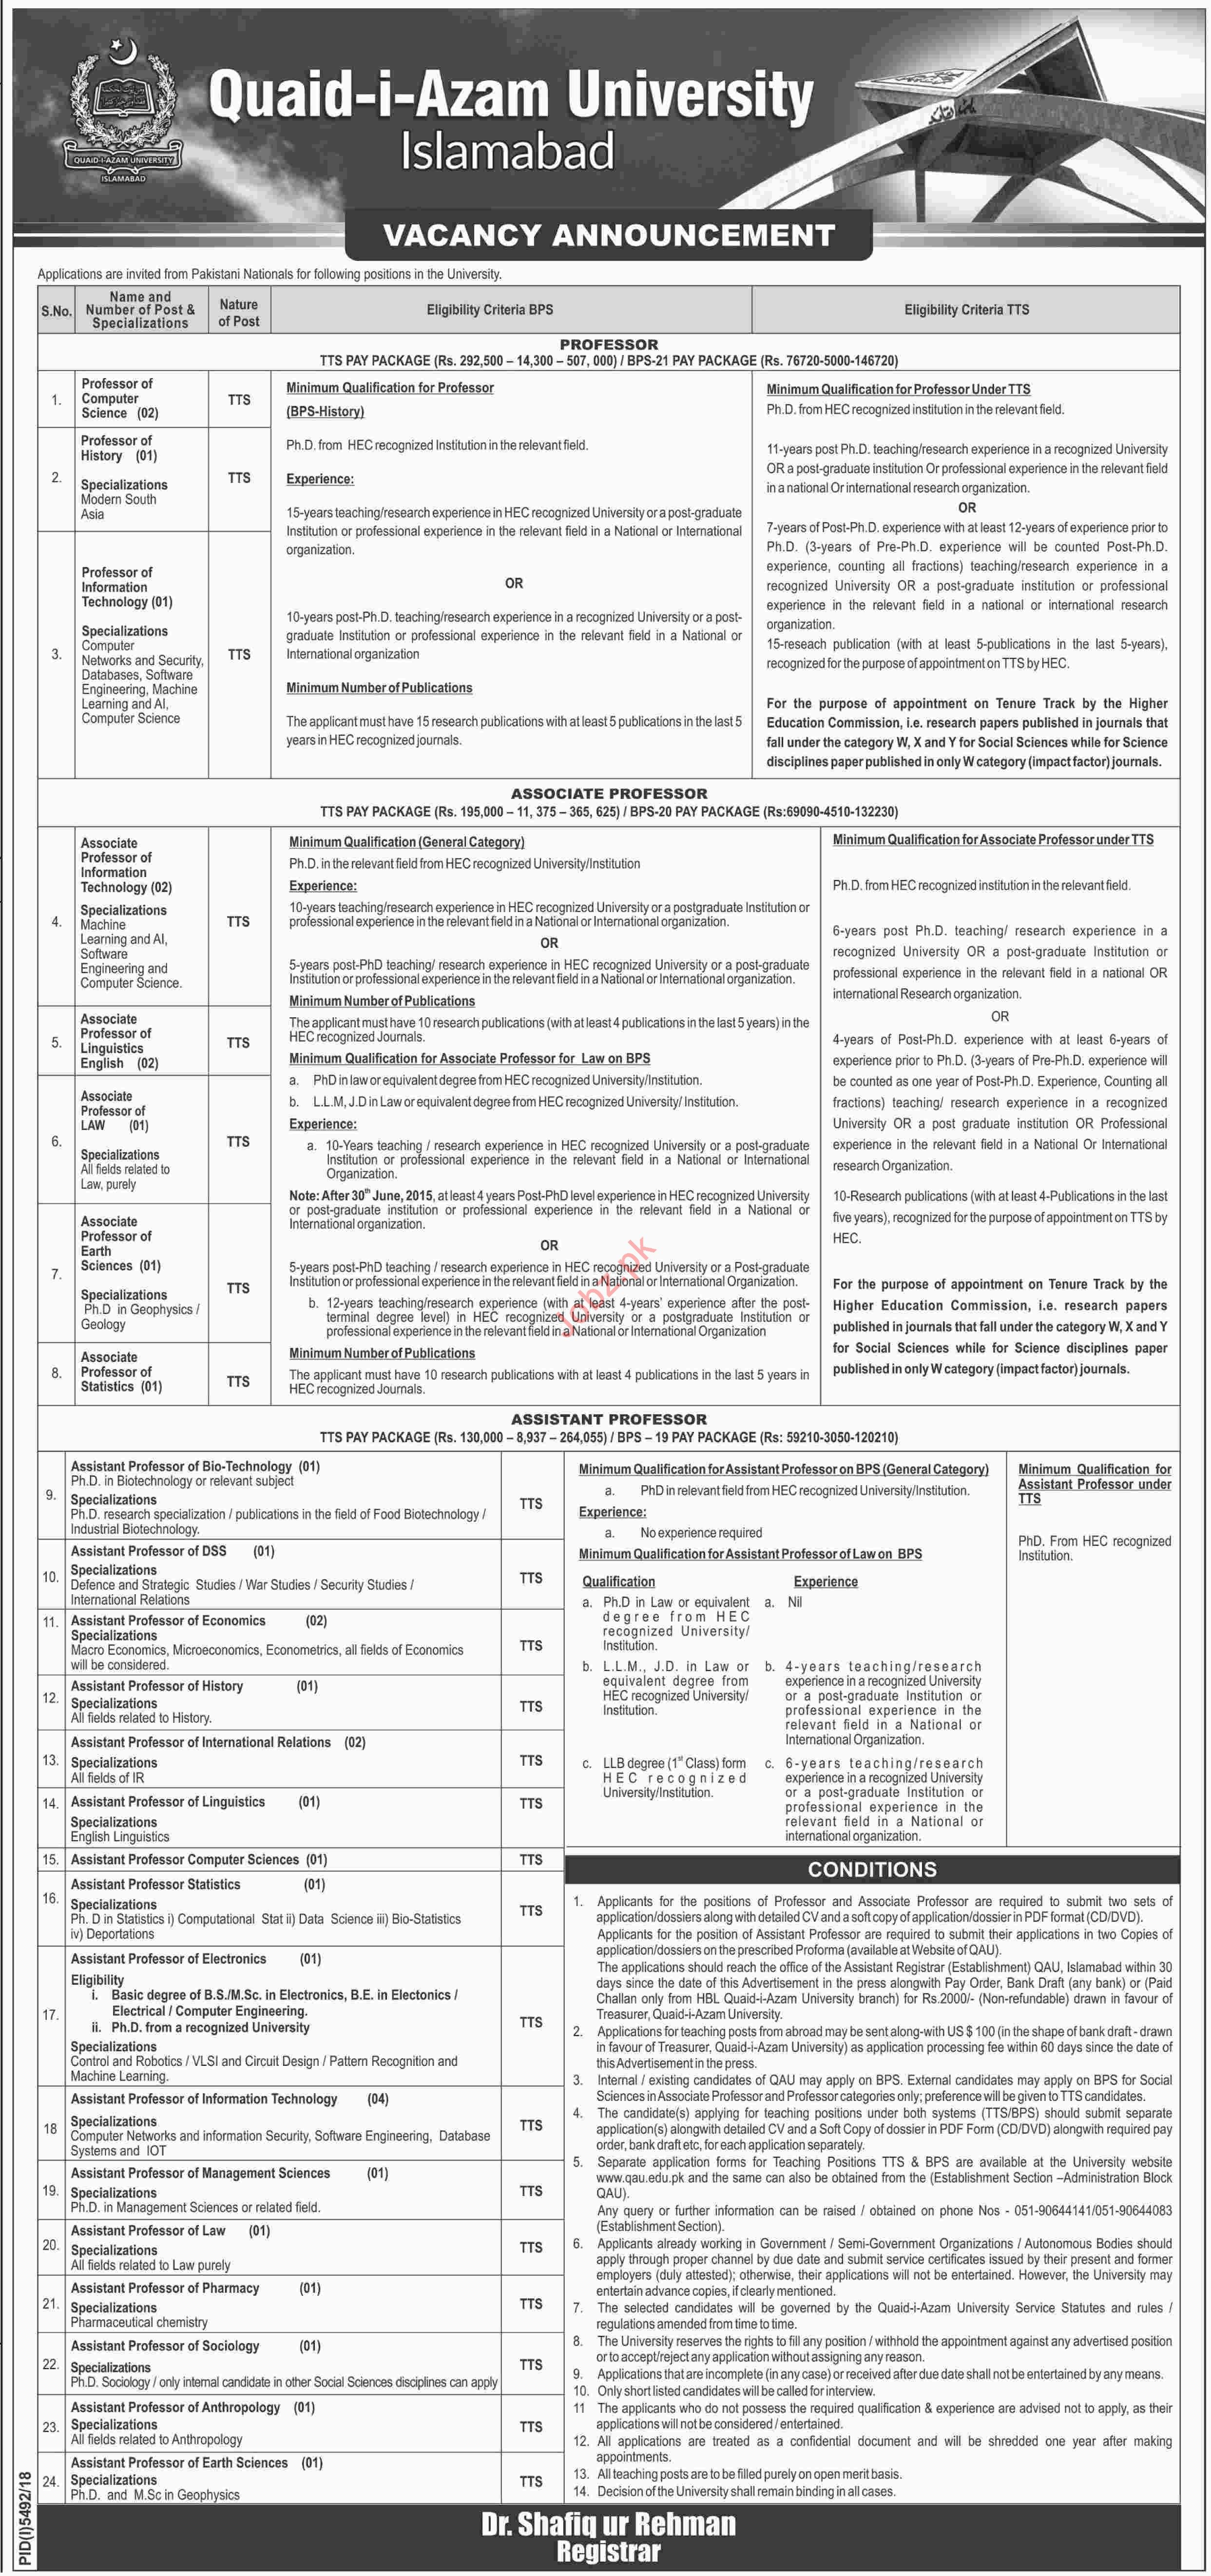 Quaid i Azam University Jobs 2019